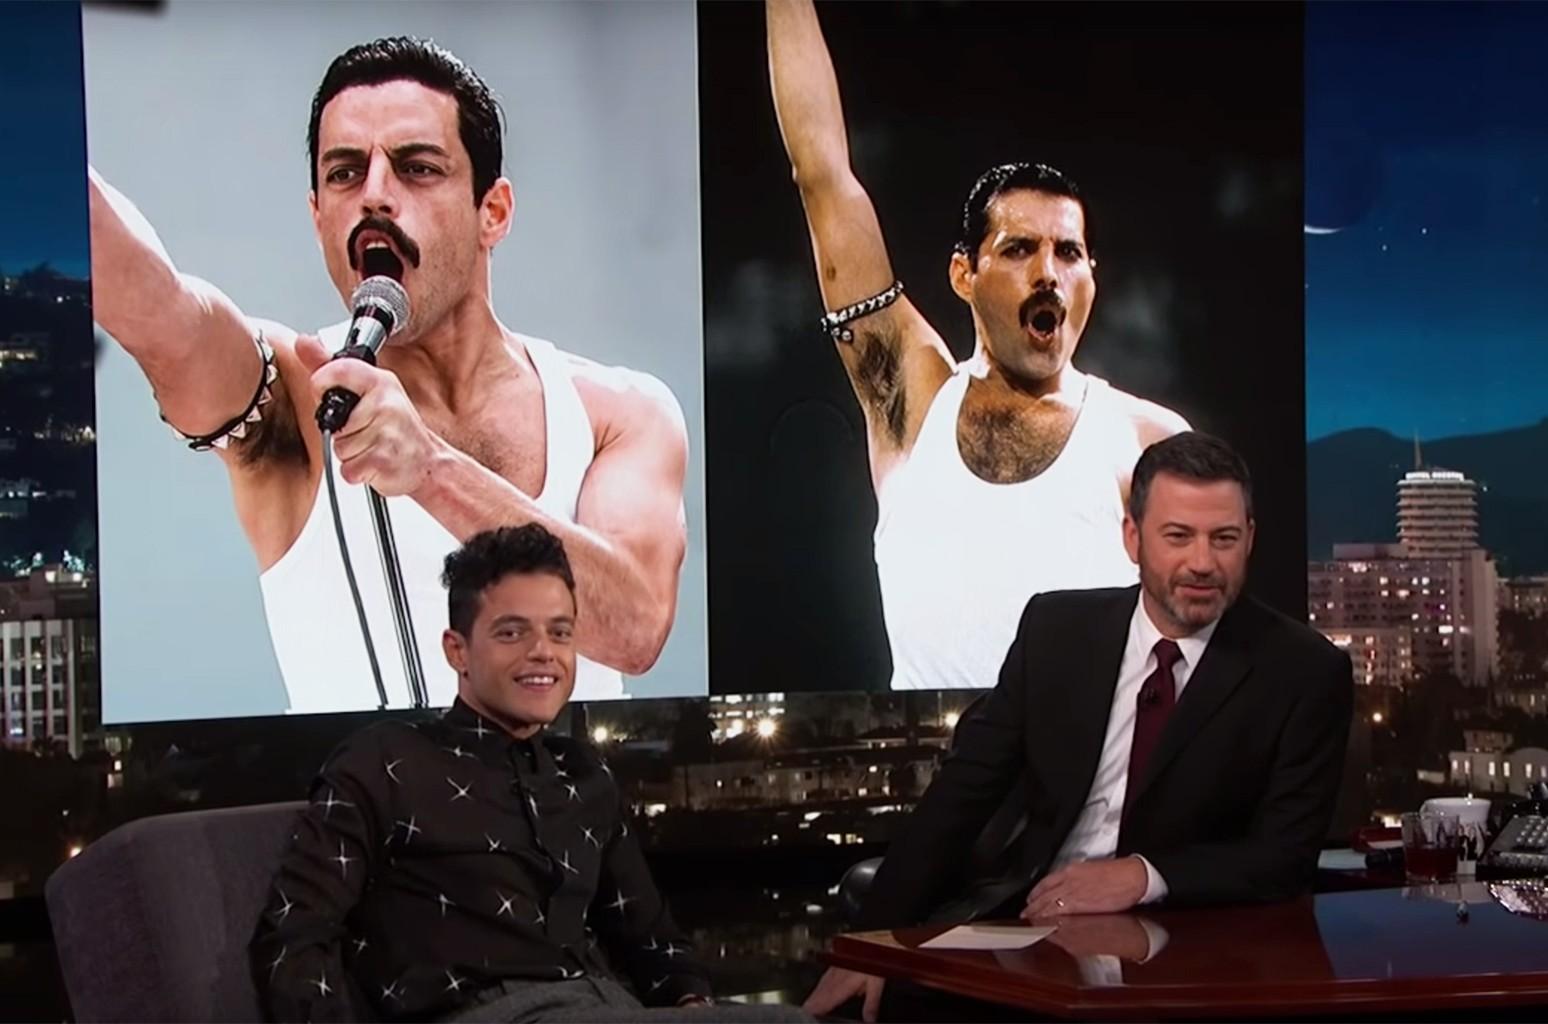 Rami Malek Jimmy Kimmel